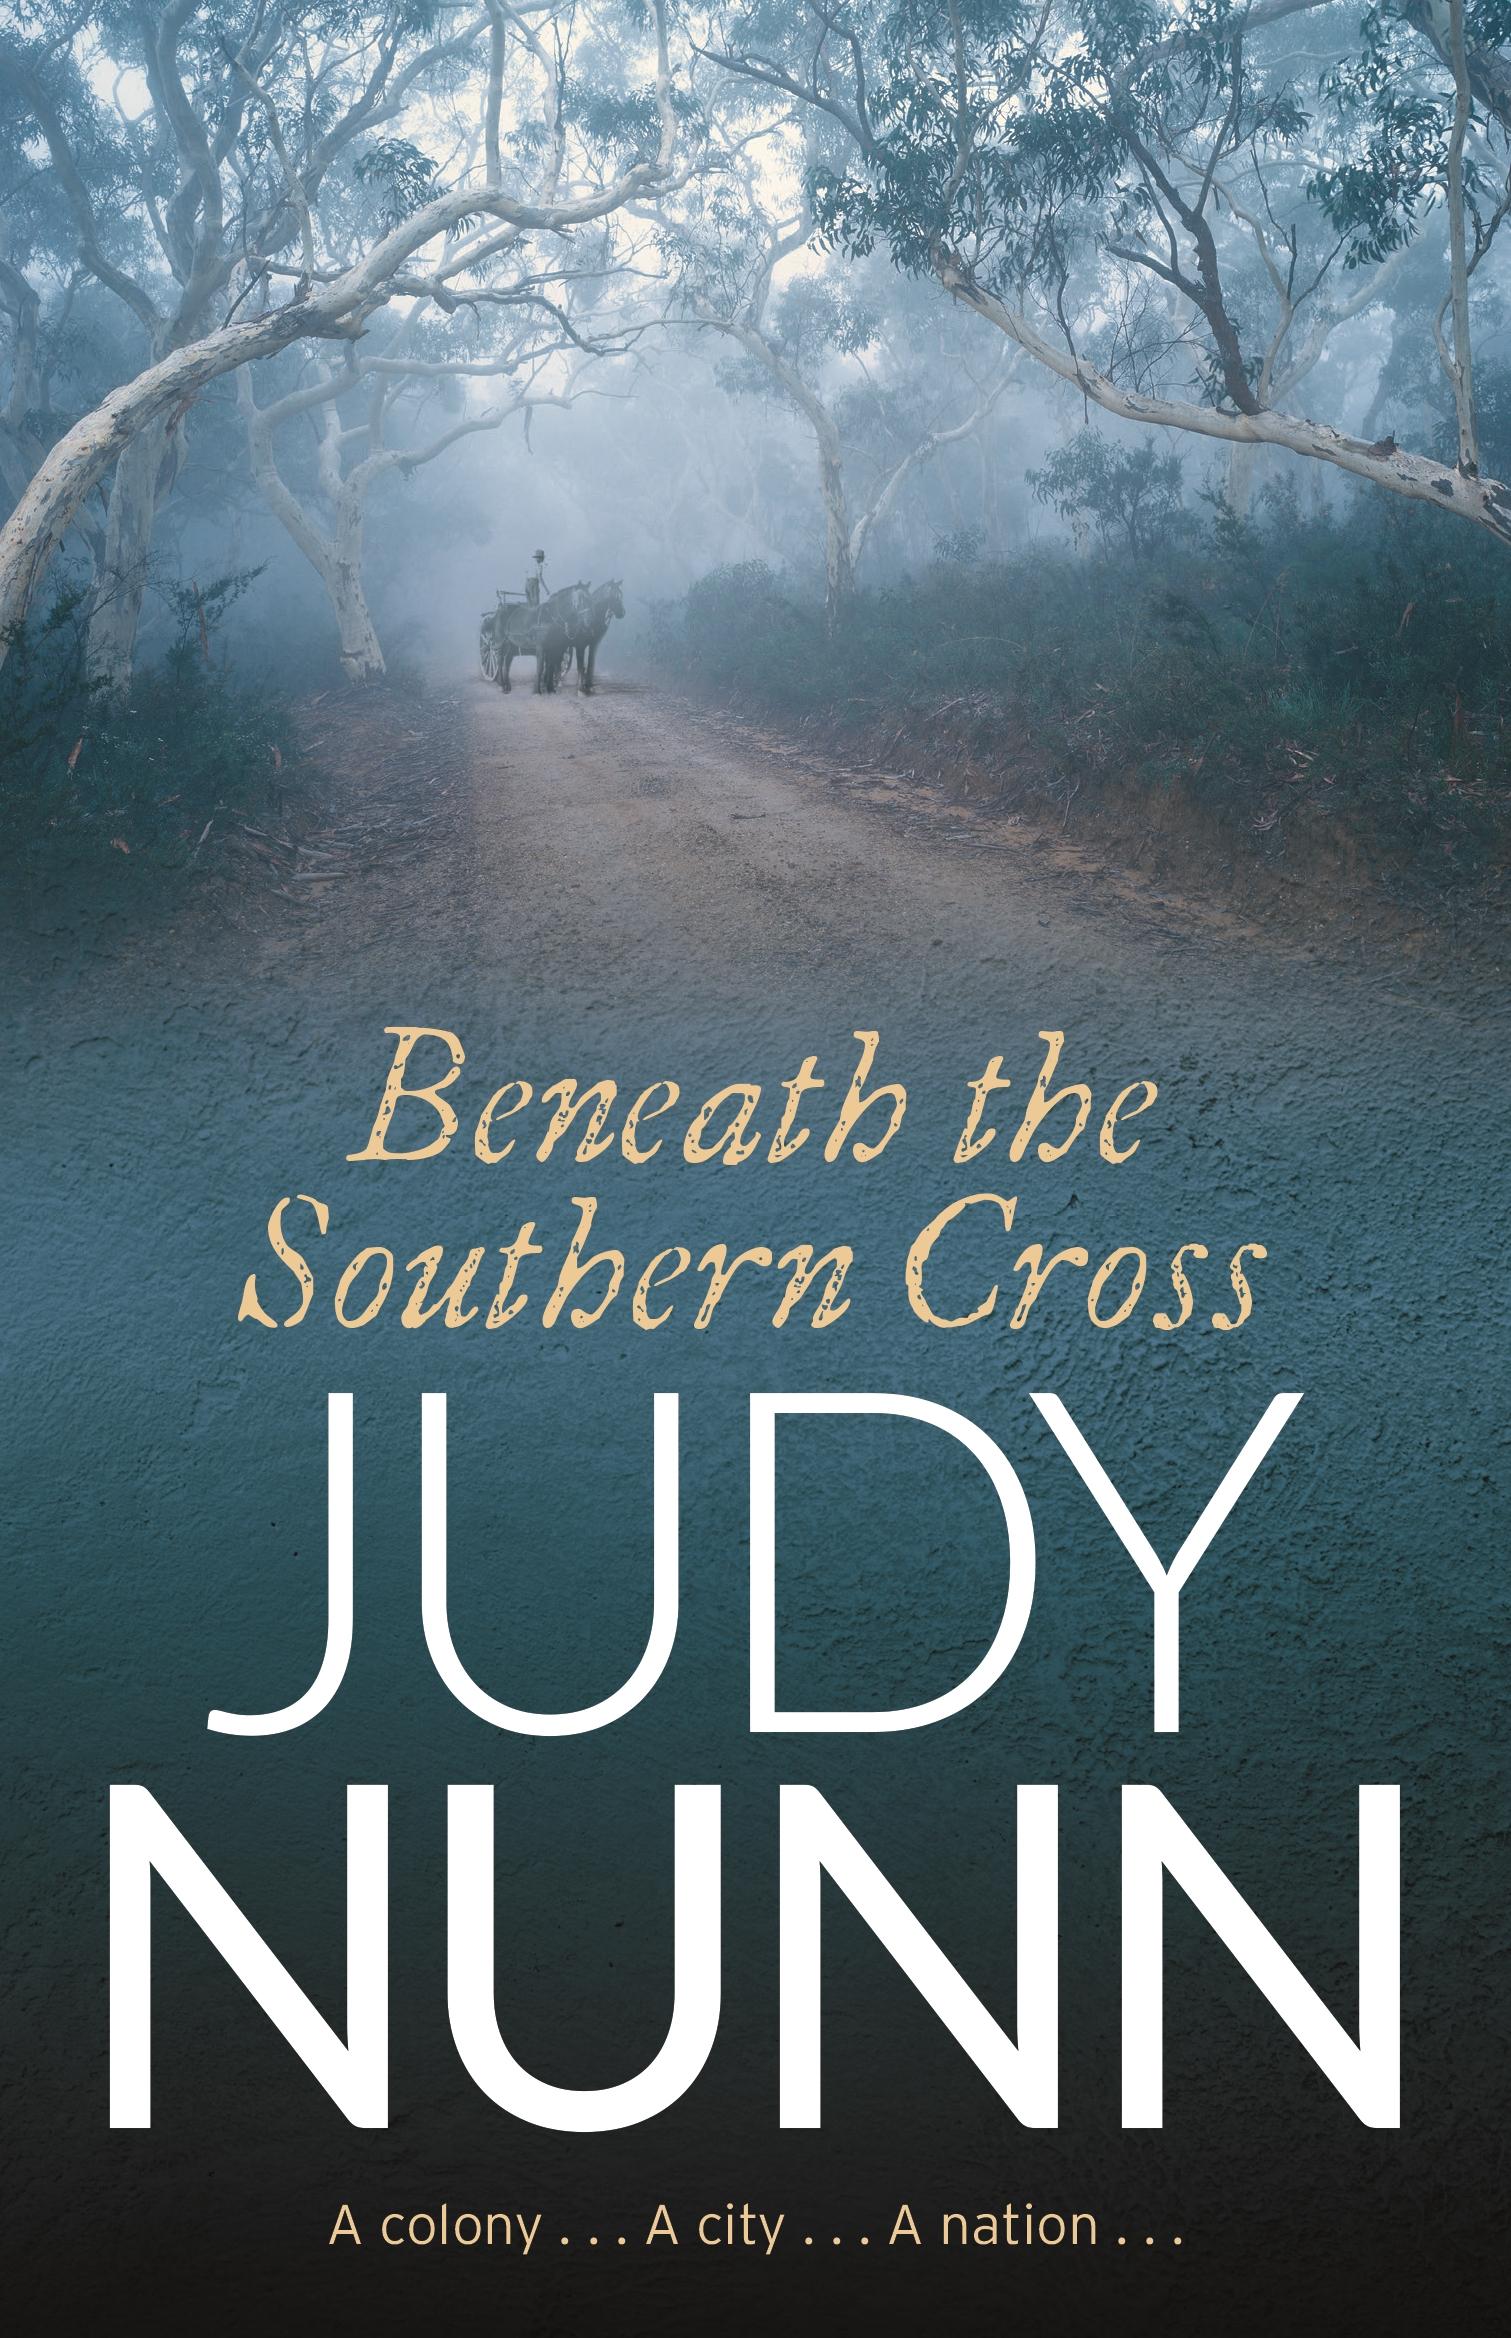 Beneath the Southern Cross